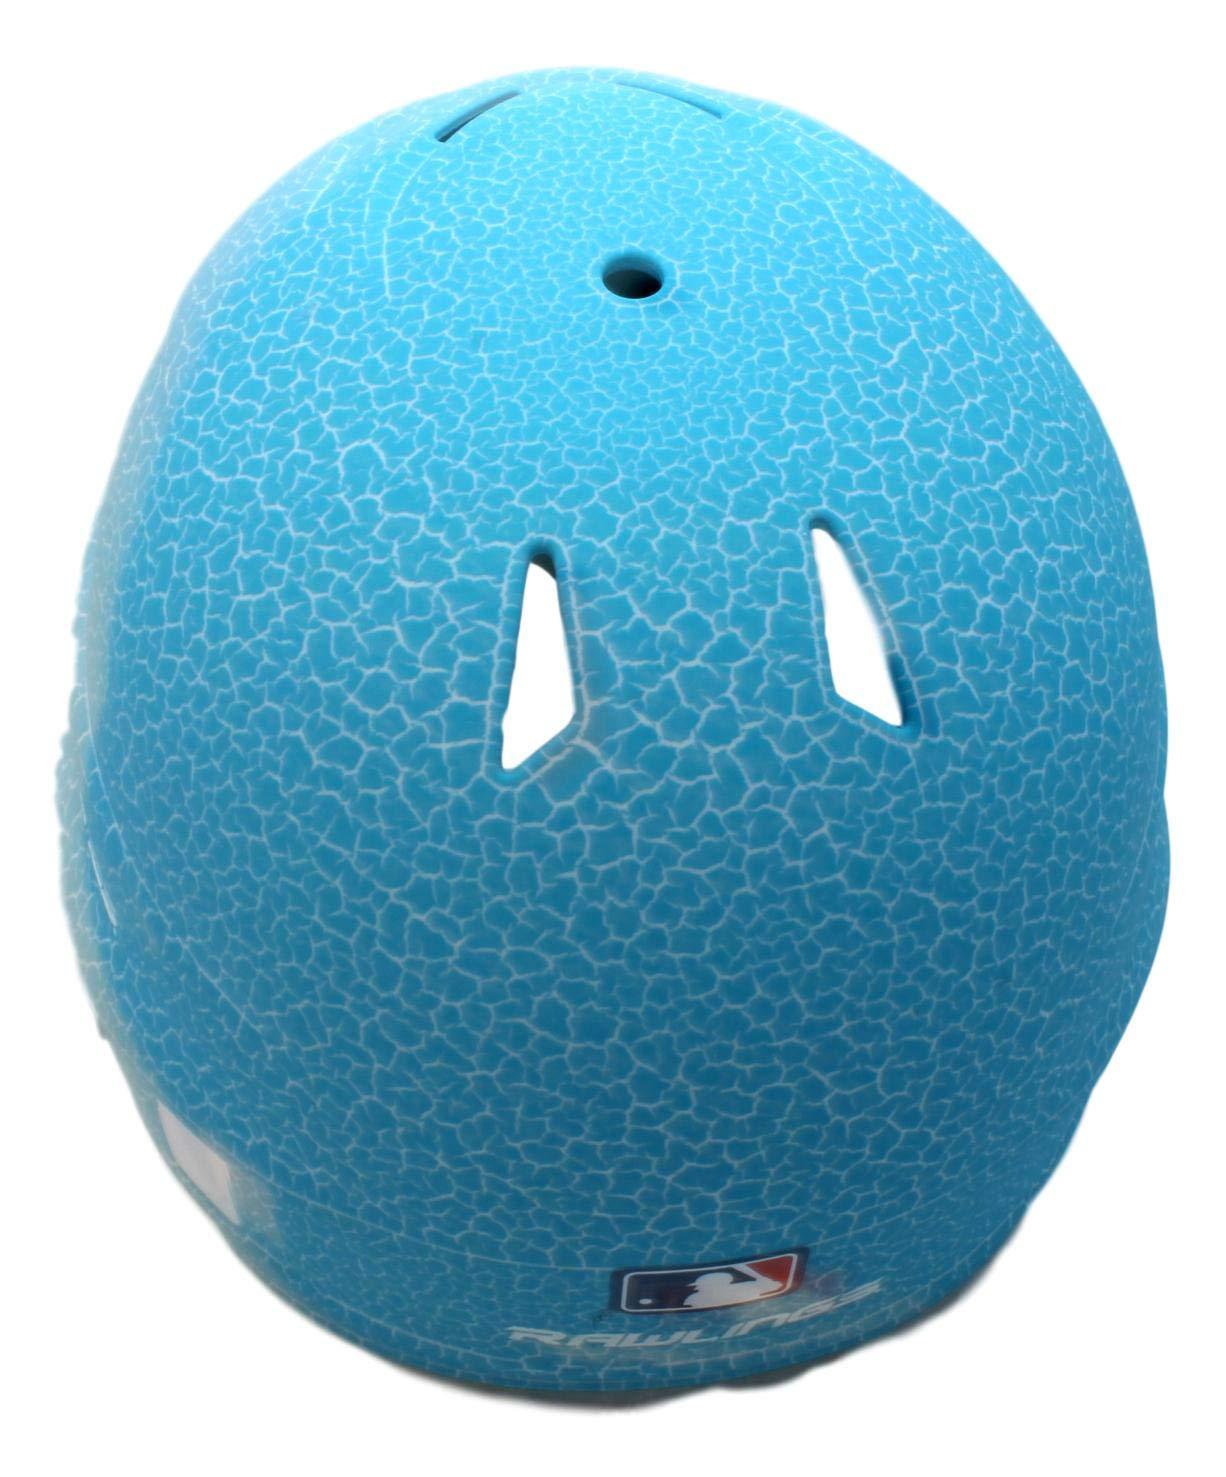 Rawlings Sporting Goods Highlighter Series Softball Helmet Matte Royal RCFHLFG